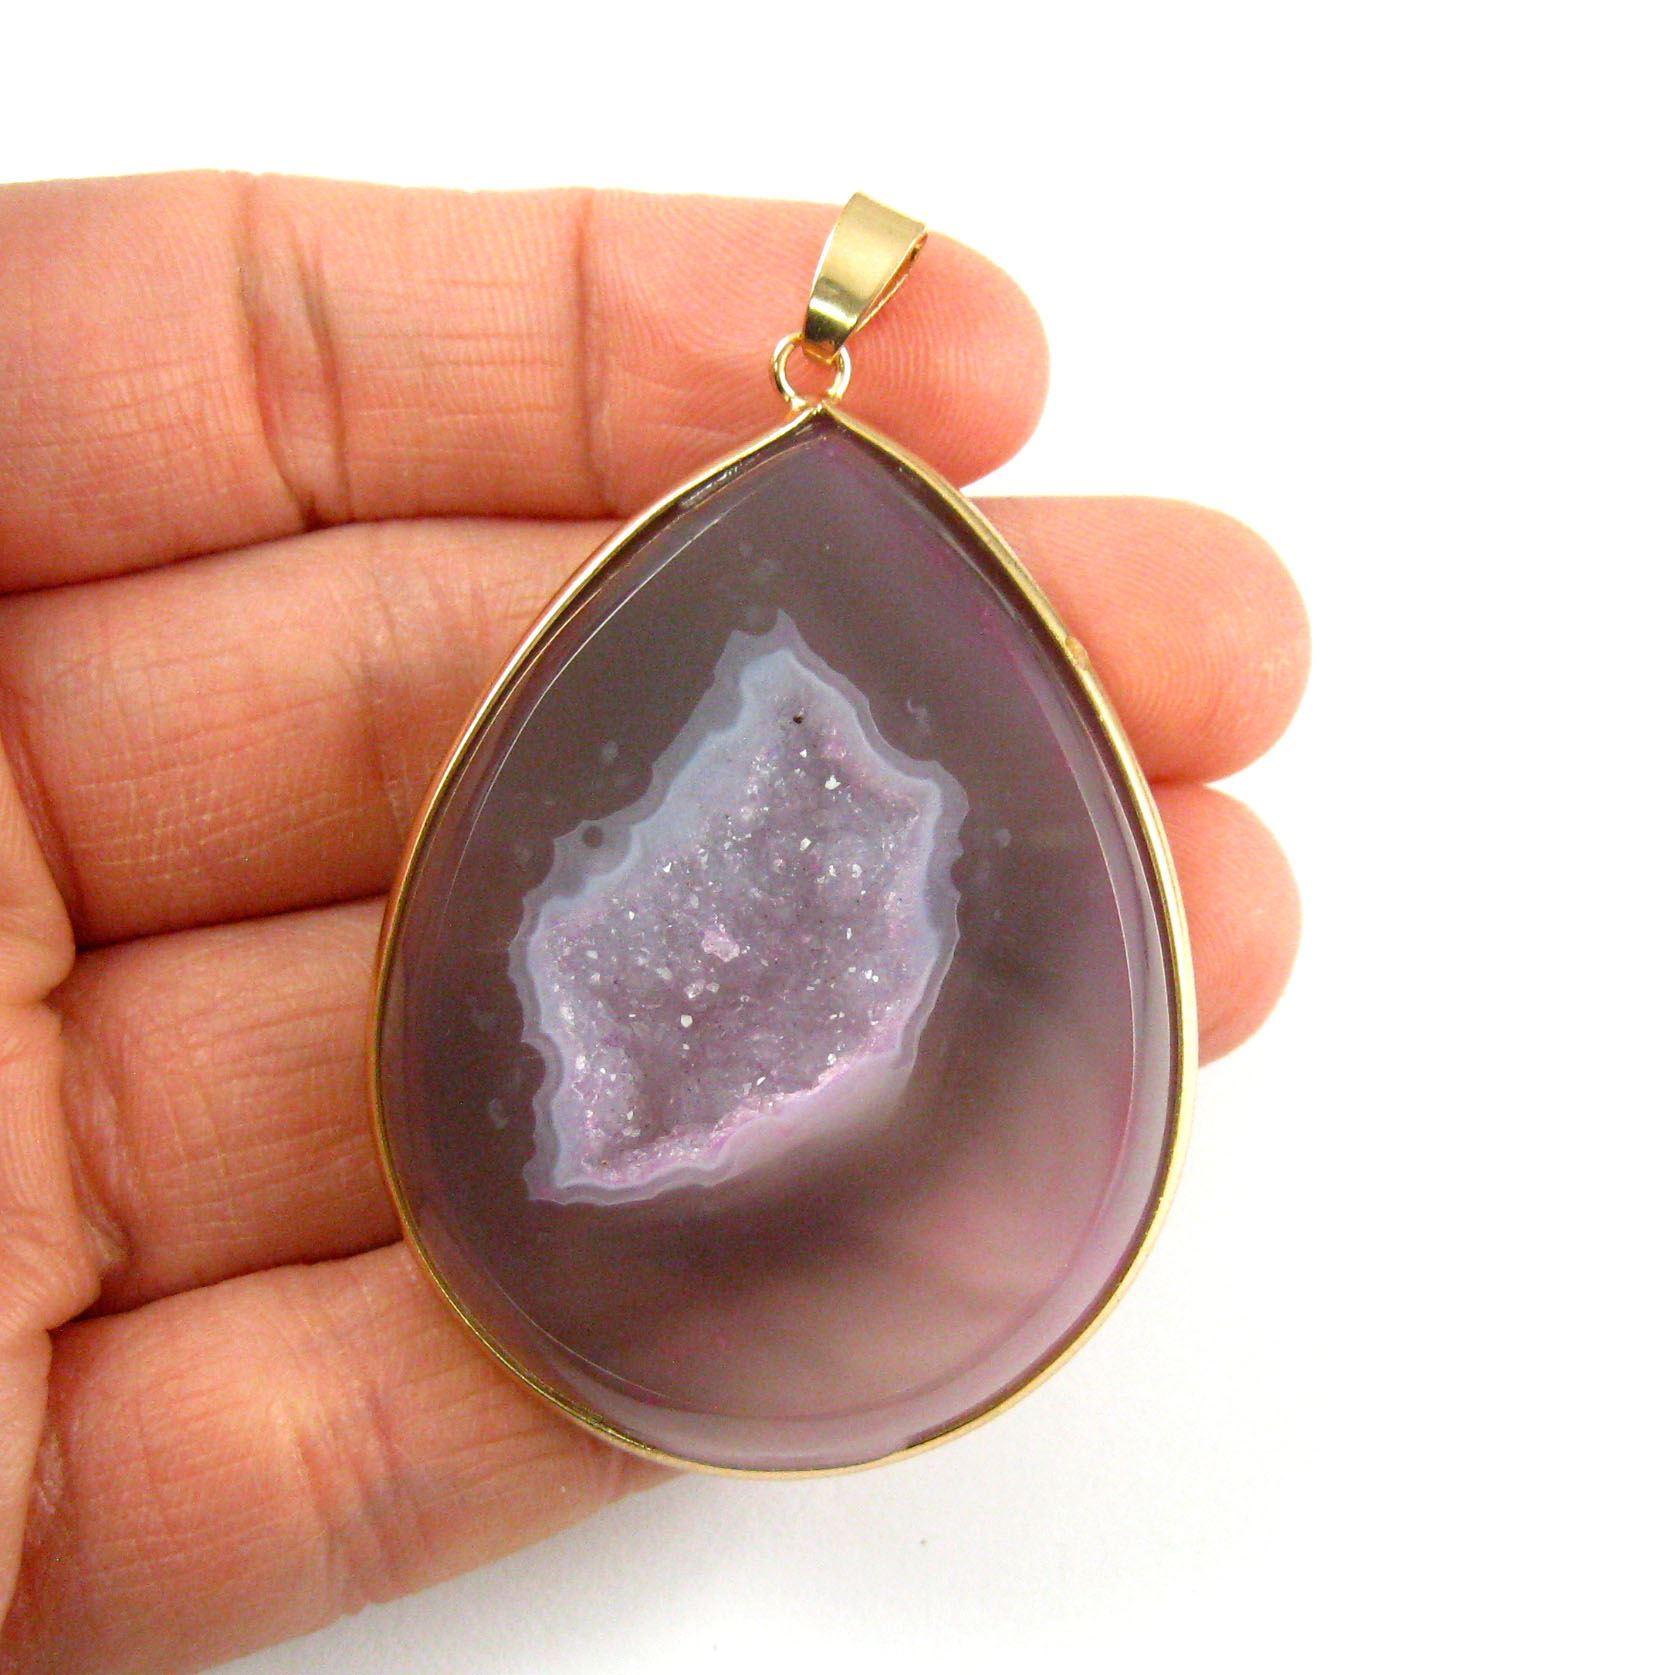 Druzy Agate Geode Pendant,Huge Geode Pendant,Natural Rainbow Agate-  Large Organic Teardrop Pendant Gold Edging and Bail - Green